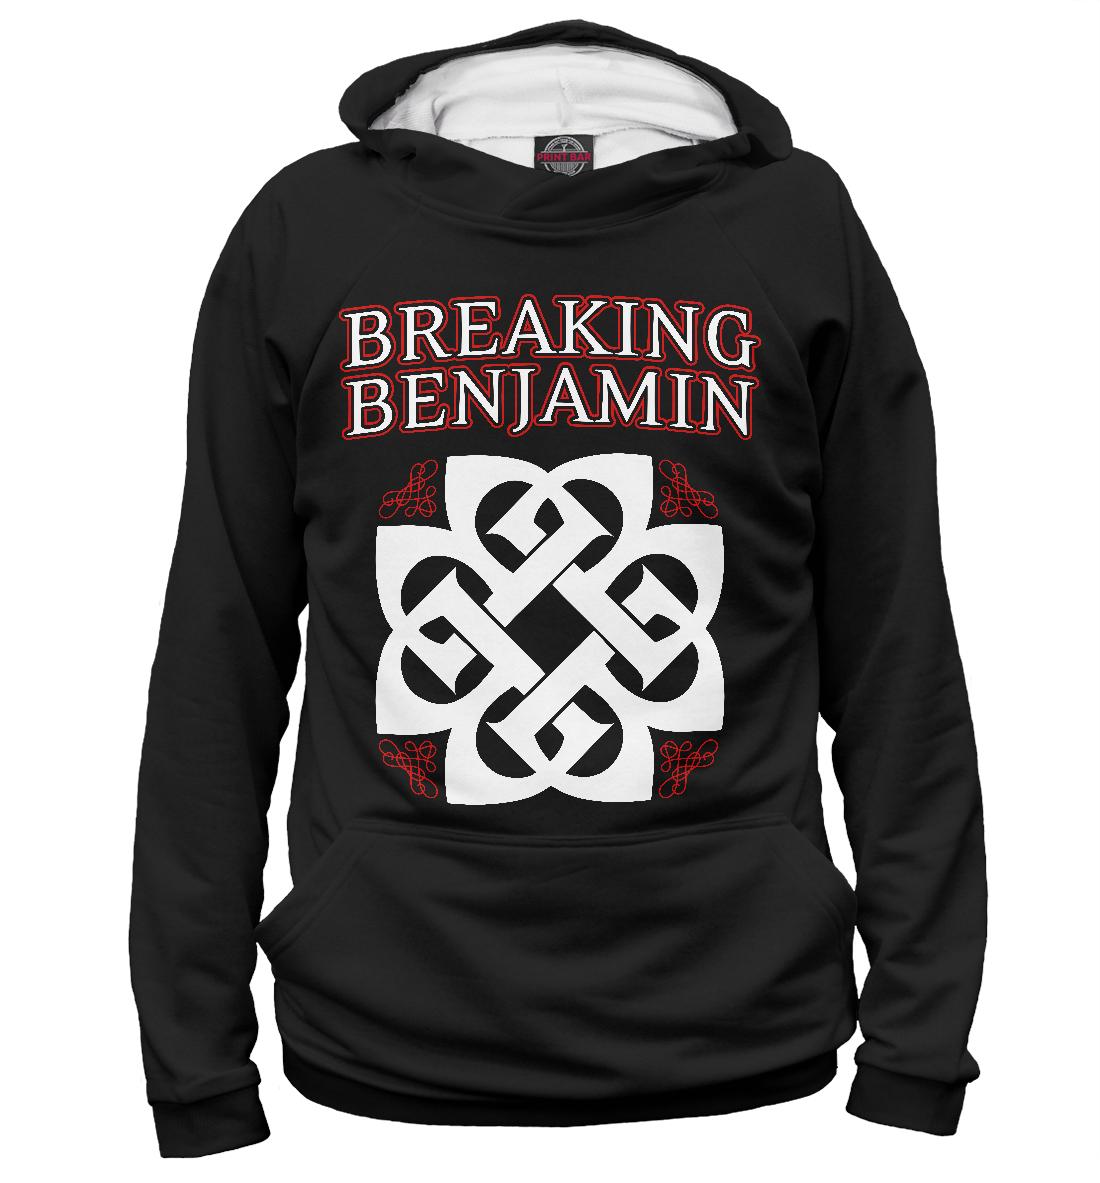 Breaking Benjamin, Printbar, Худи, MZK-832447-hud-1  - купить со скидкой